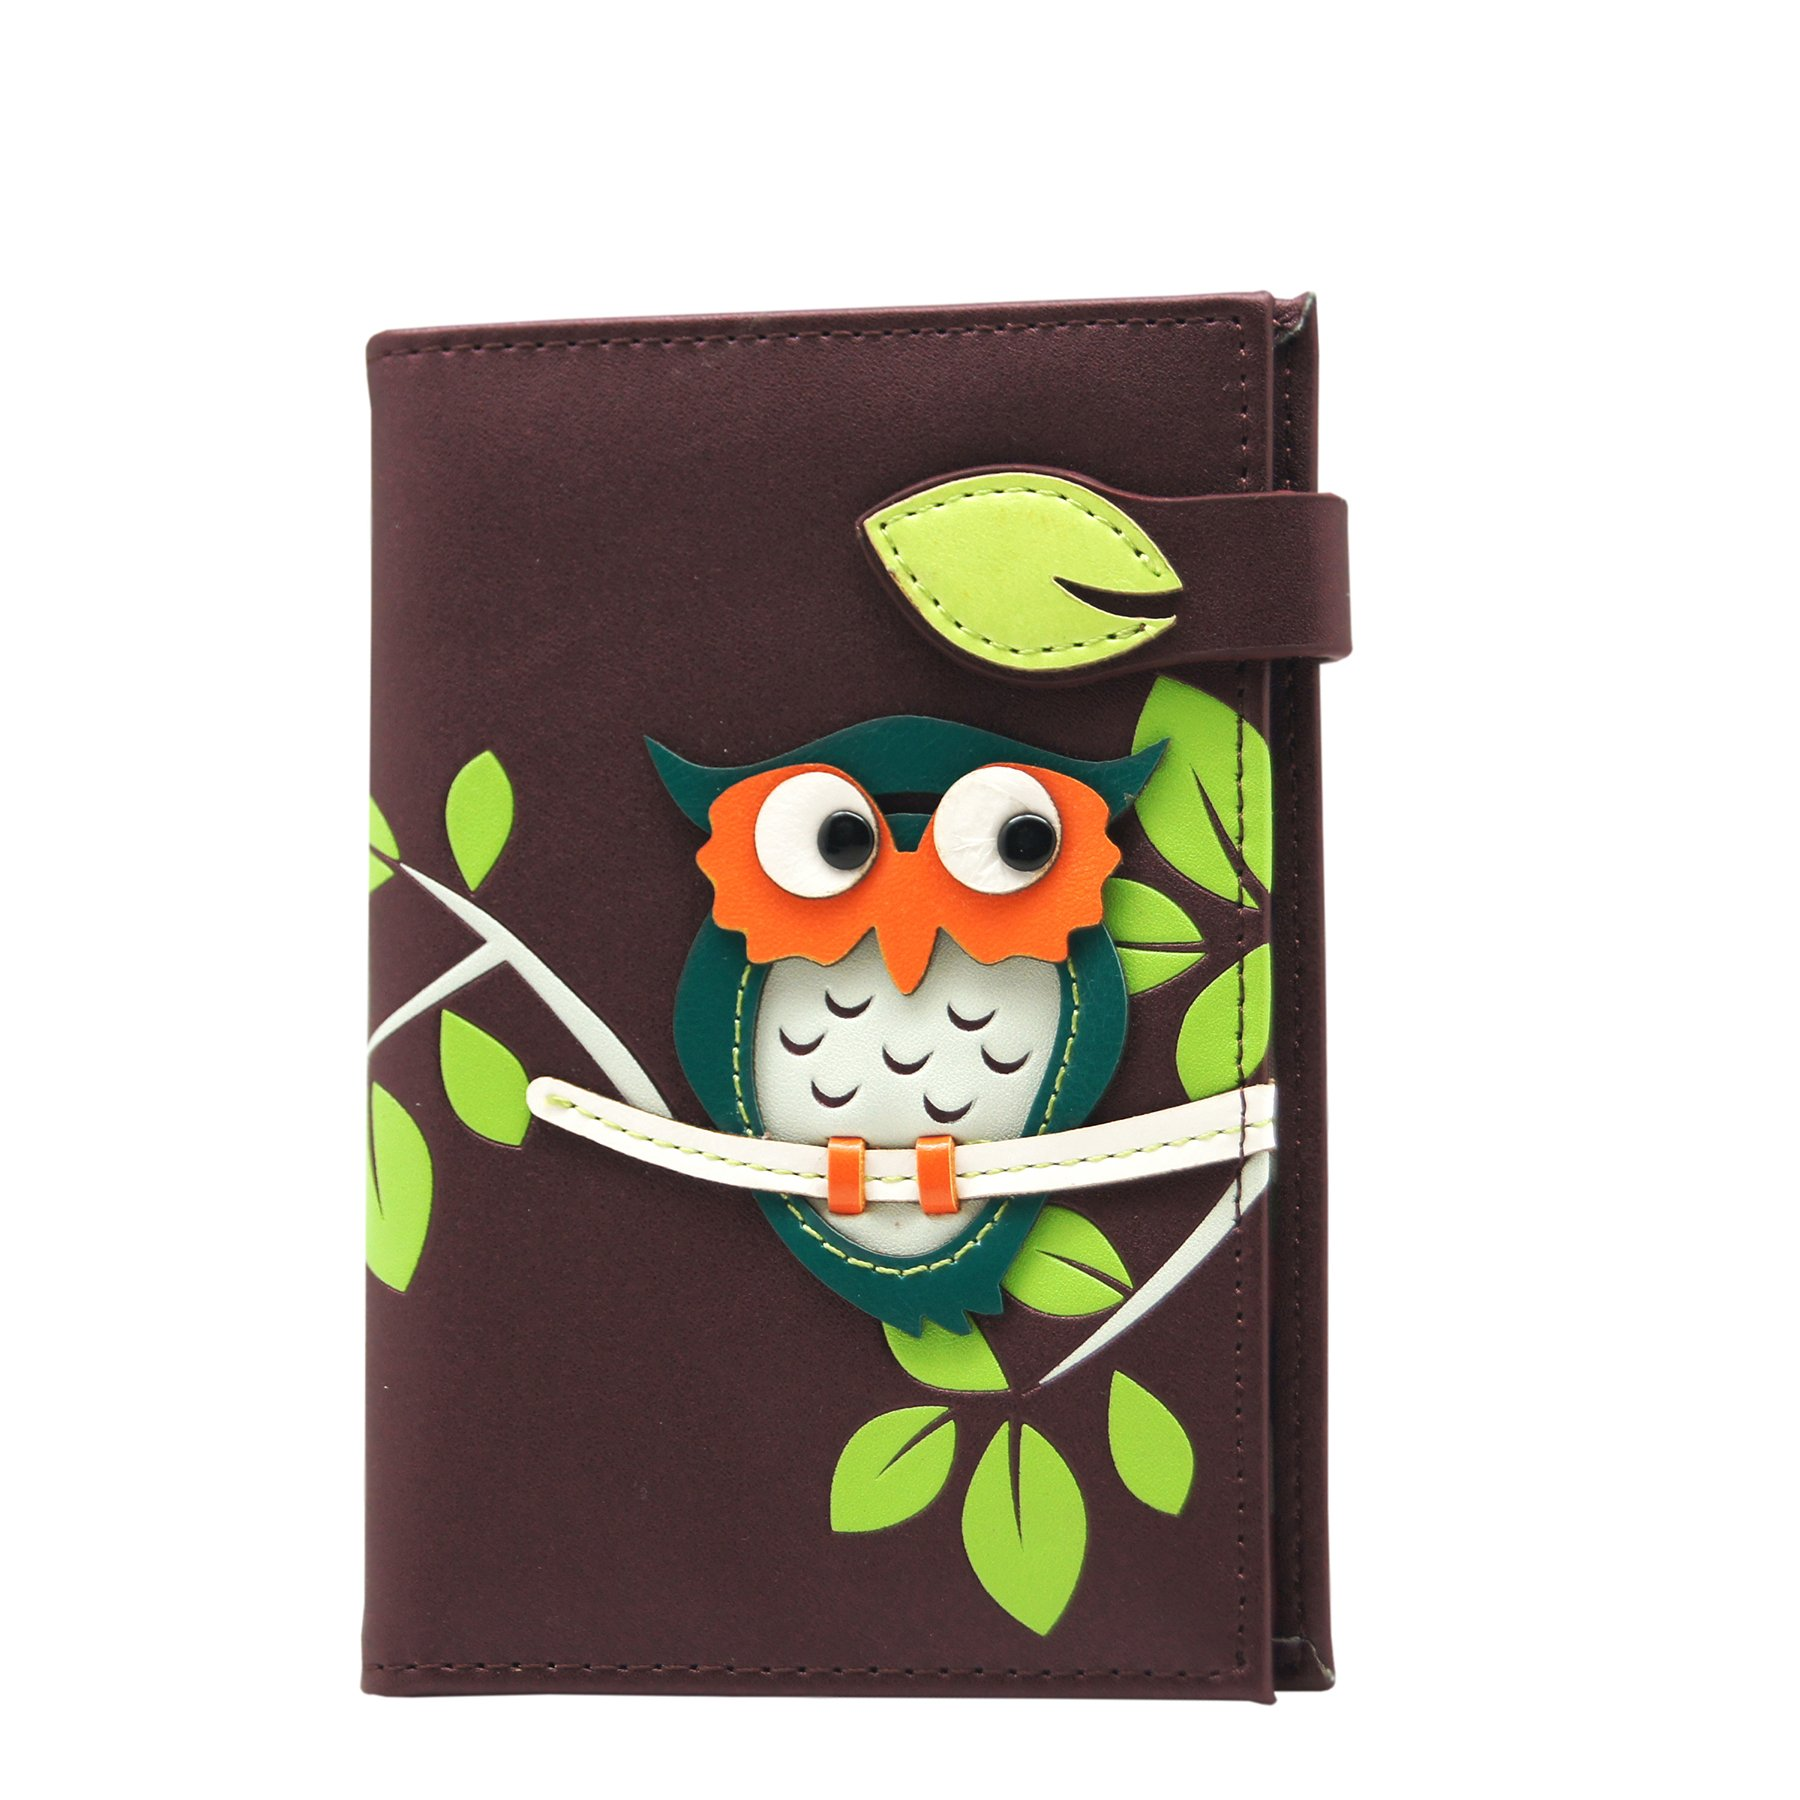 RFID Blocking Passport Holder for Men & Women - Appliqued Owl Design - Purple Color. Menkai brand.